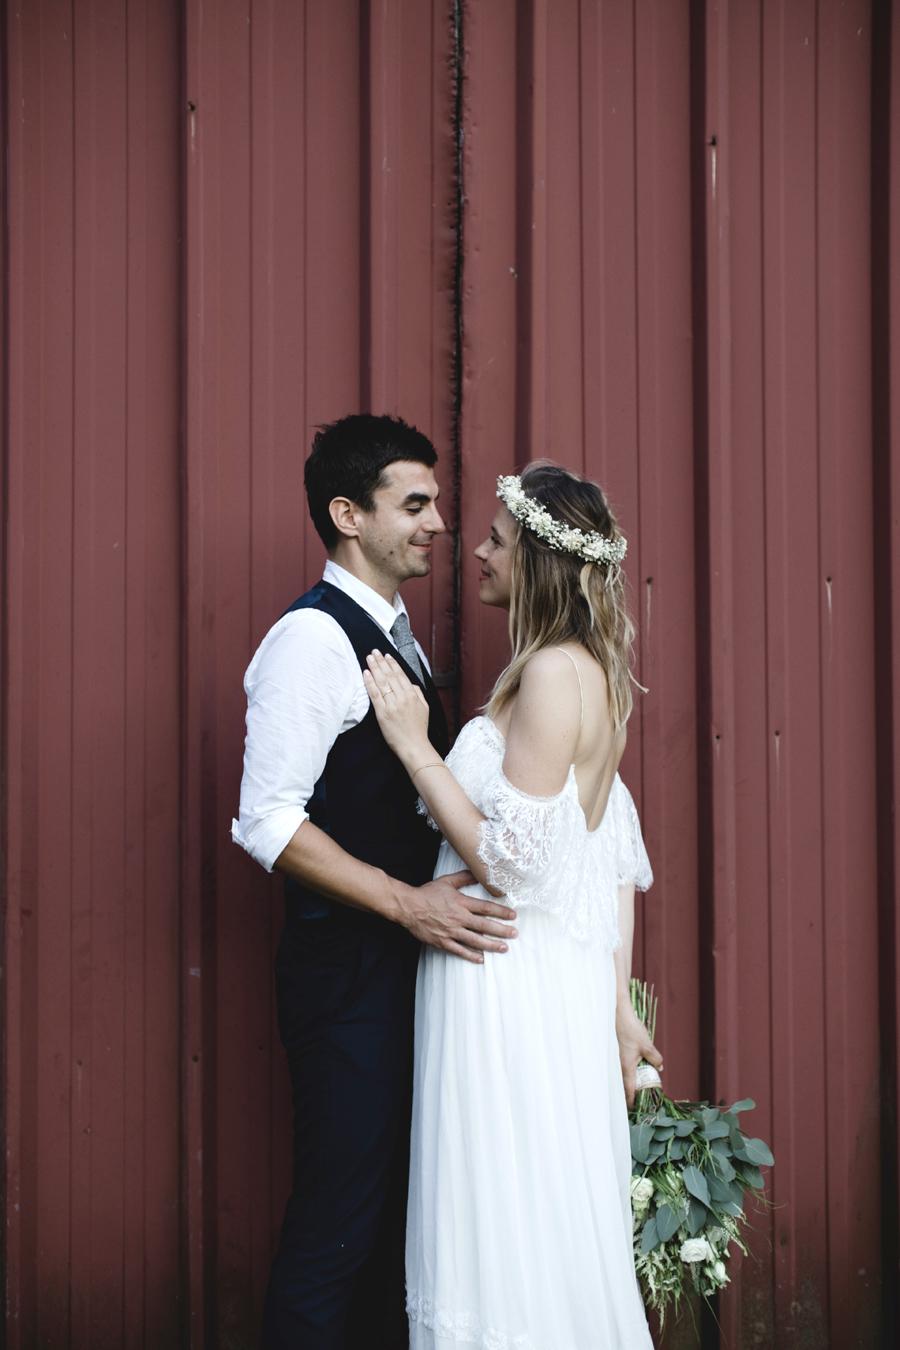 celine_marks_mariage_aurelie_keil_155